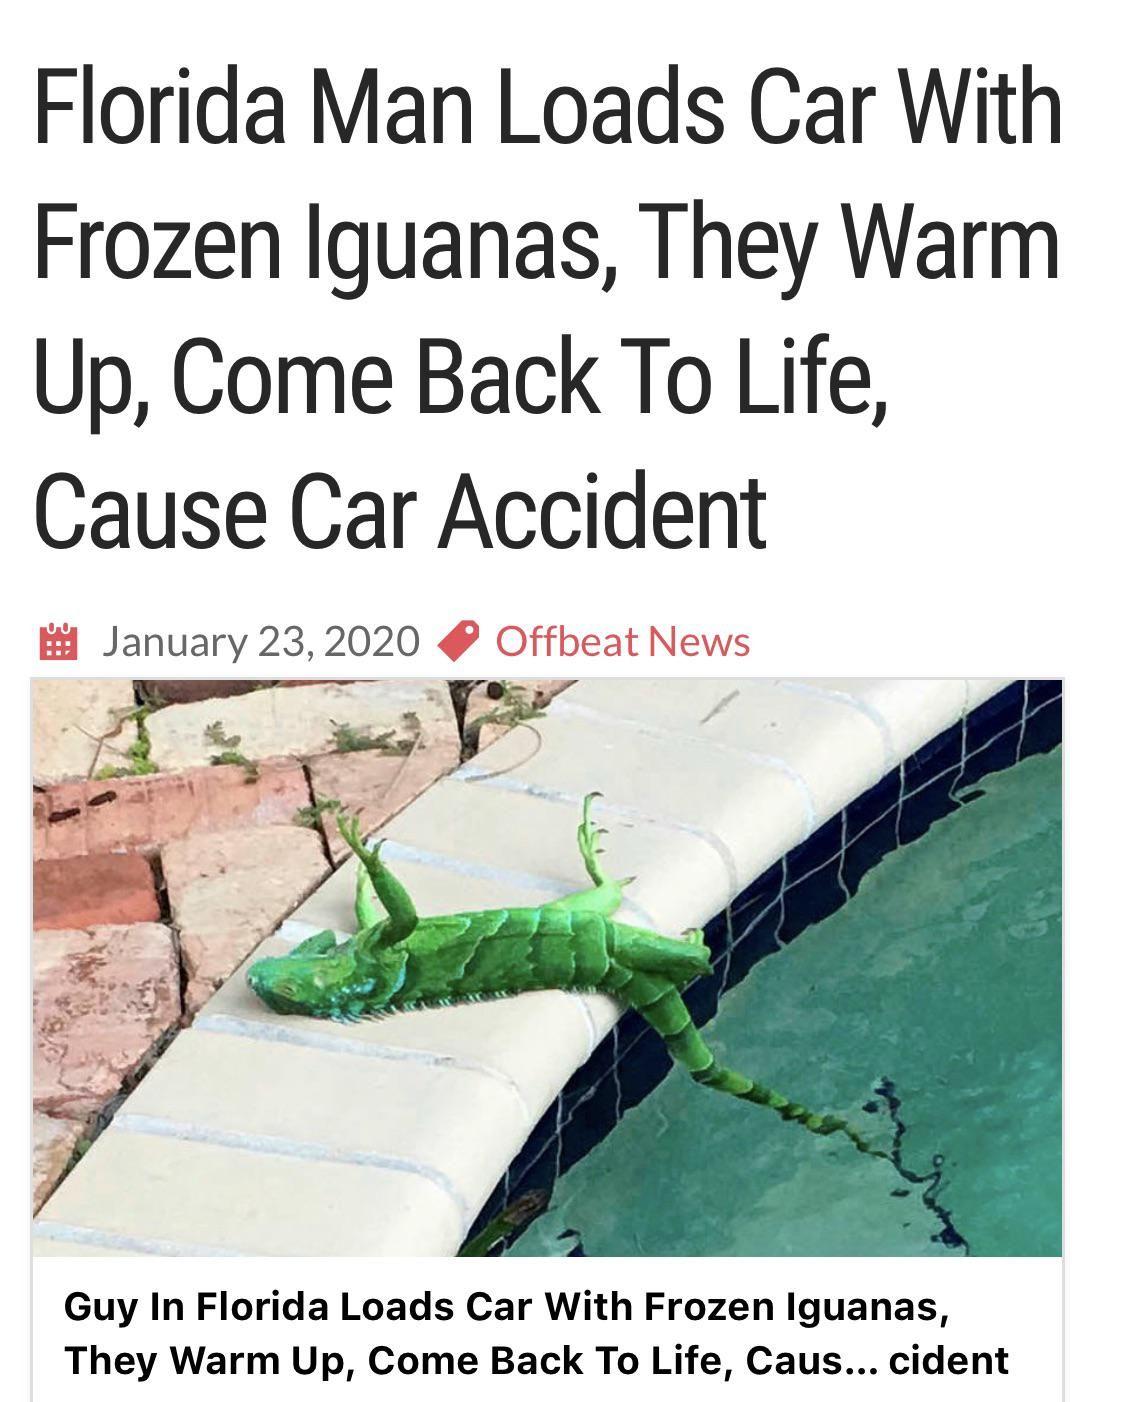 Florida Man had big plans!